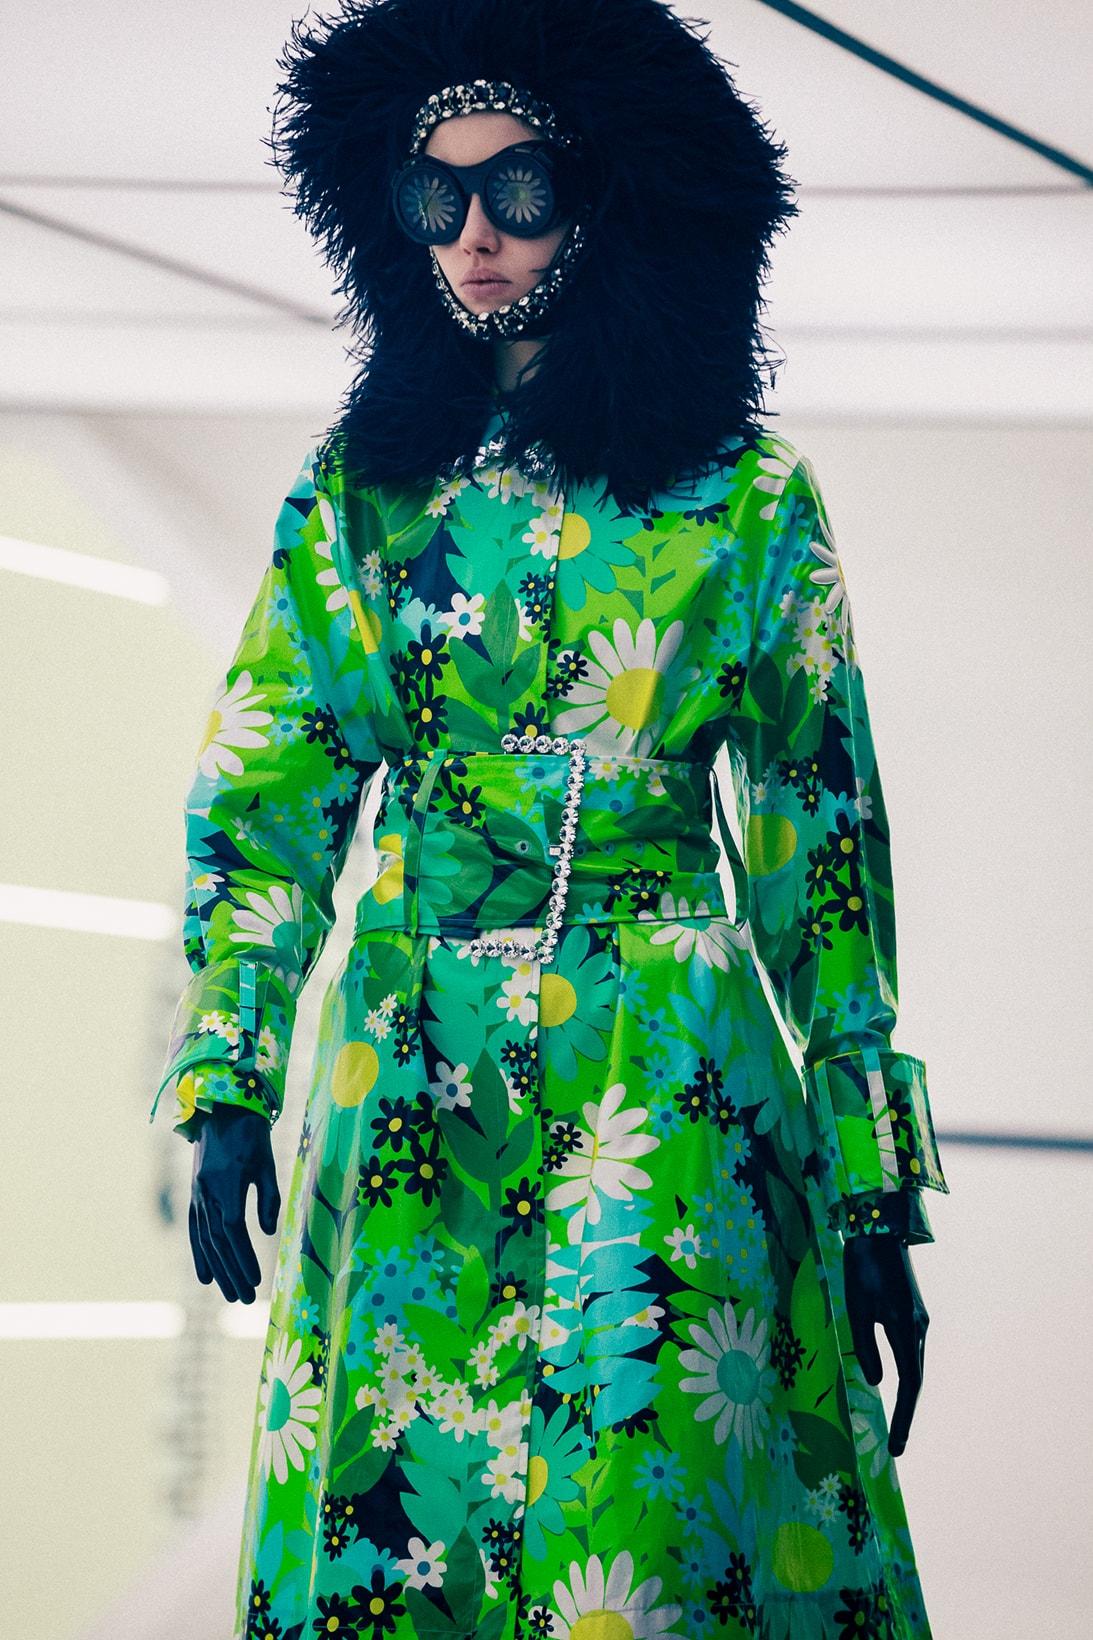 moncler genius milan fashion week fall winter collaborations richard quinn 1952